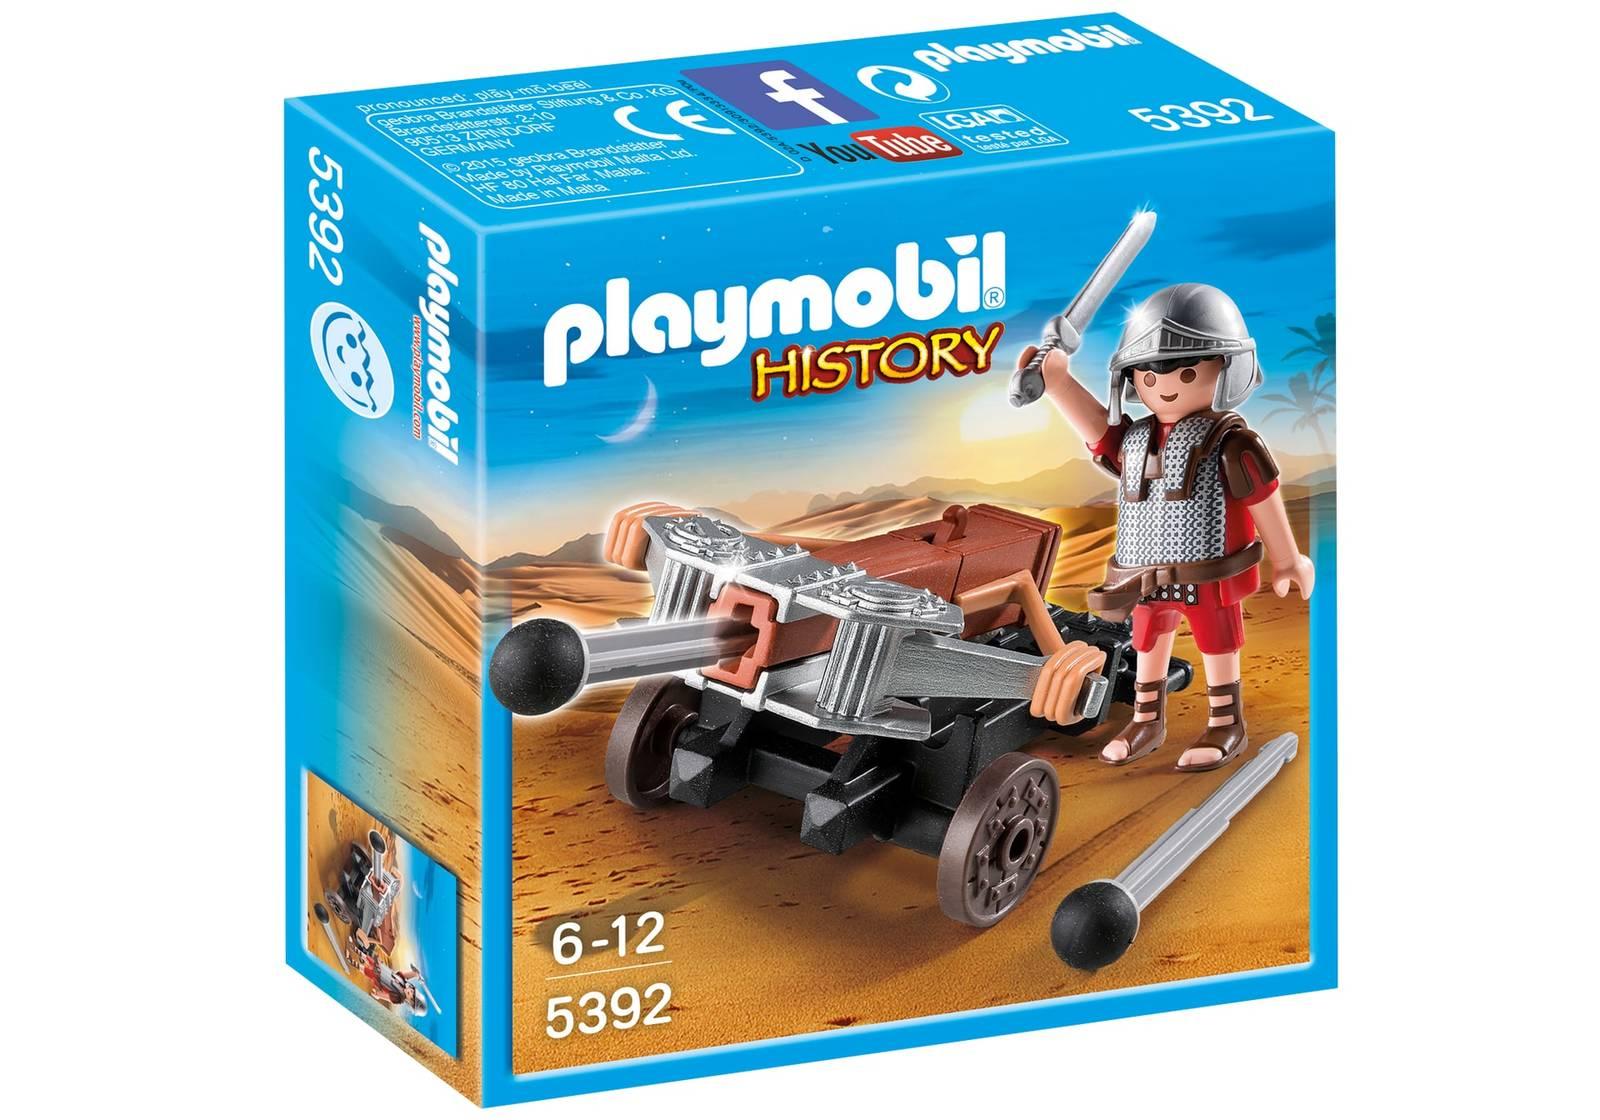 Playmobil: History - Legionnaire with Ballista image